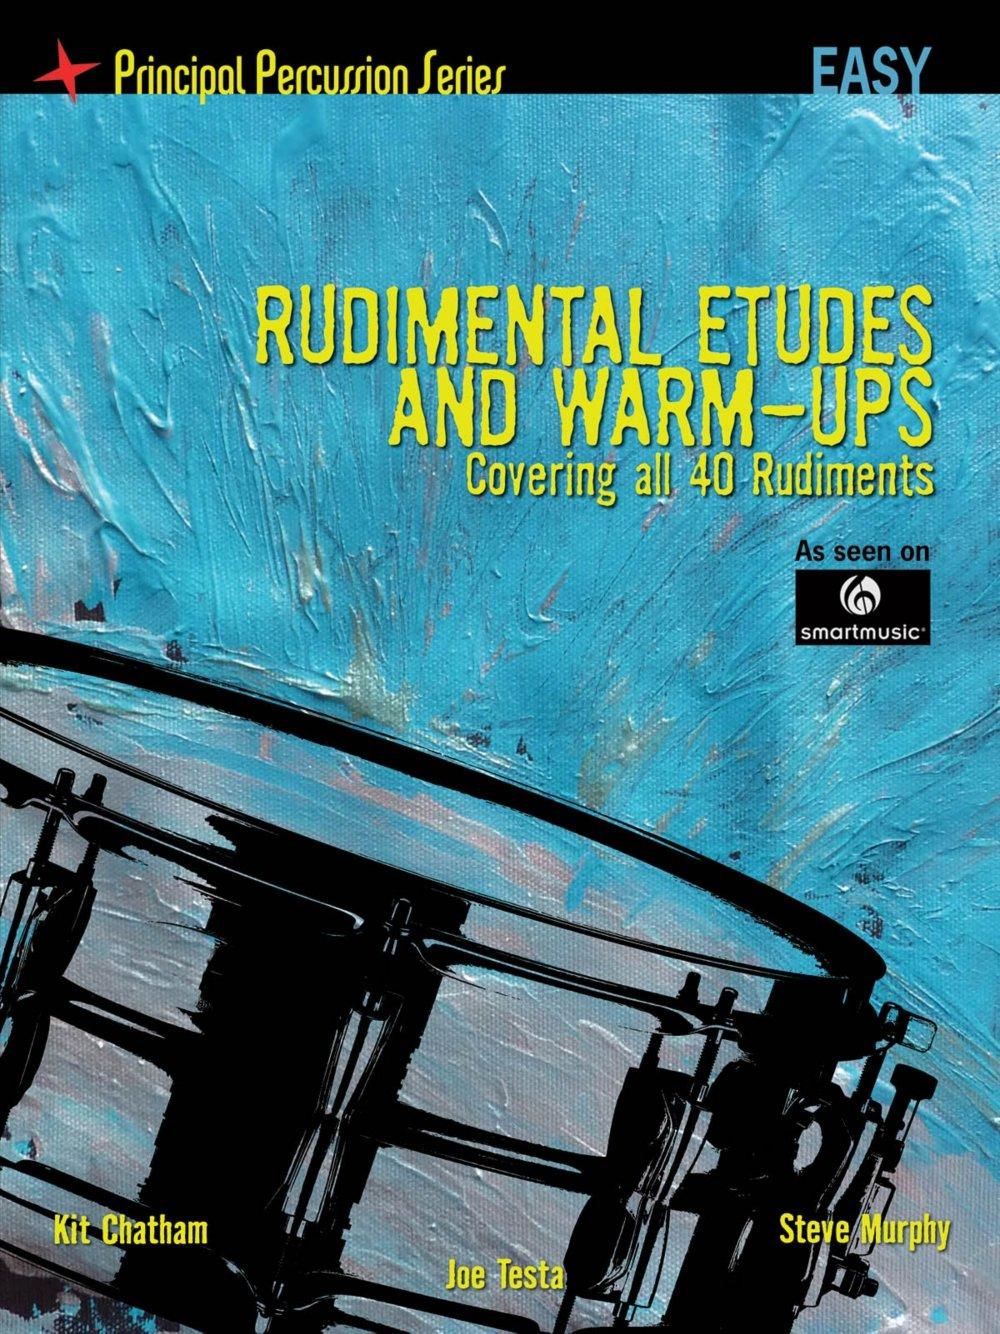 Hal Leonard The Principal Percussion Series Easy Level - Rudimental Etudes and Warm-Ups Covering All 40 Rudiments